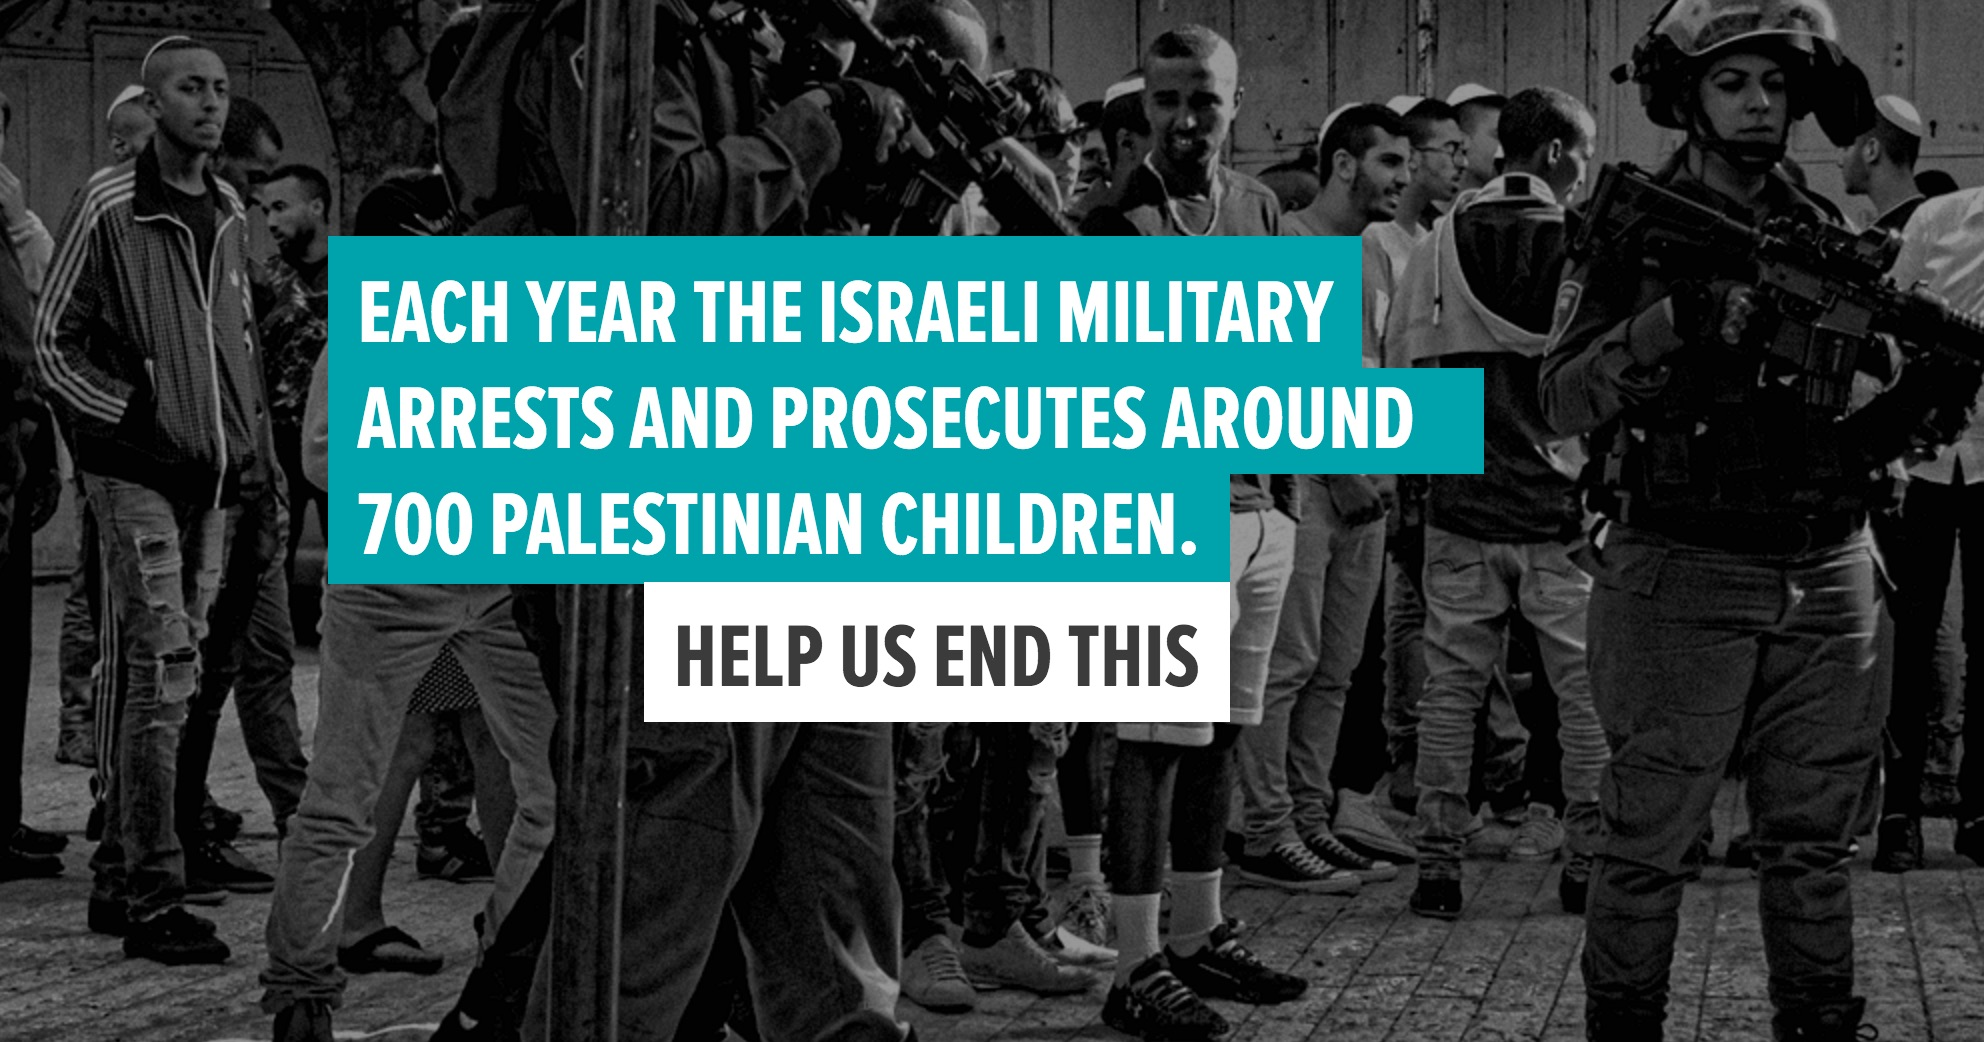 Ecumenical Accompaniment Program in Palestine and Israel (EAPPI) / M. Guntern.